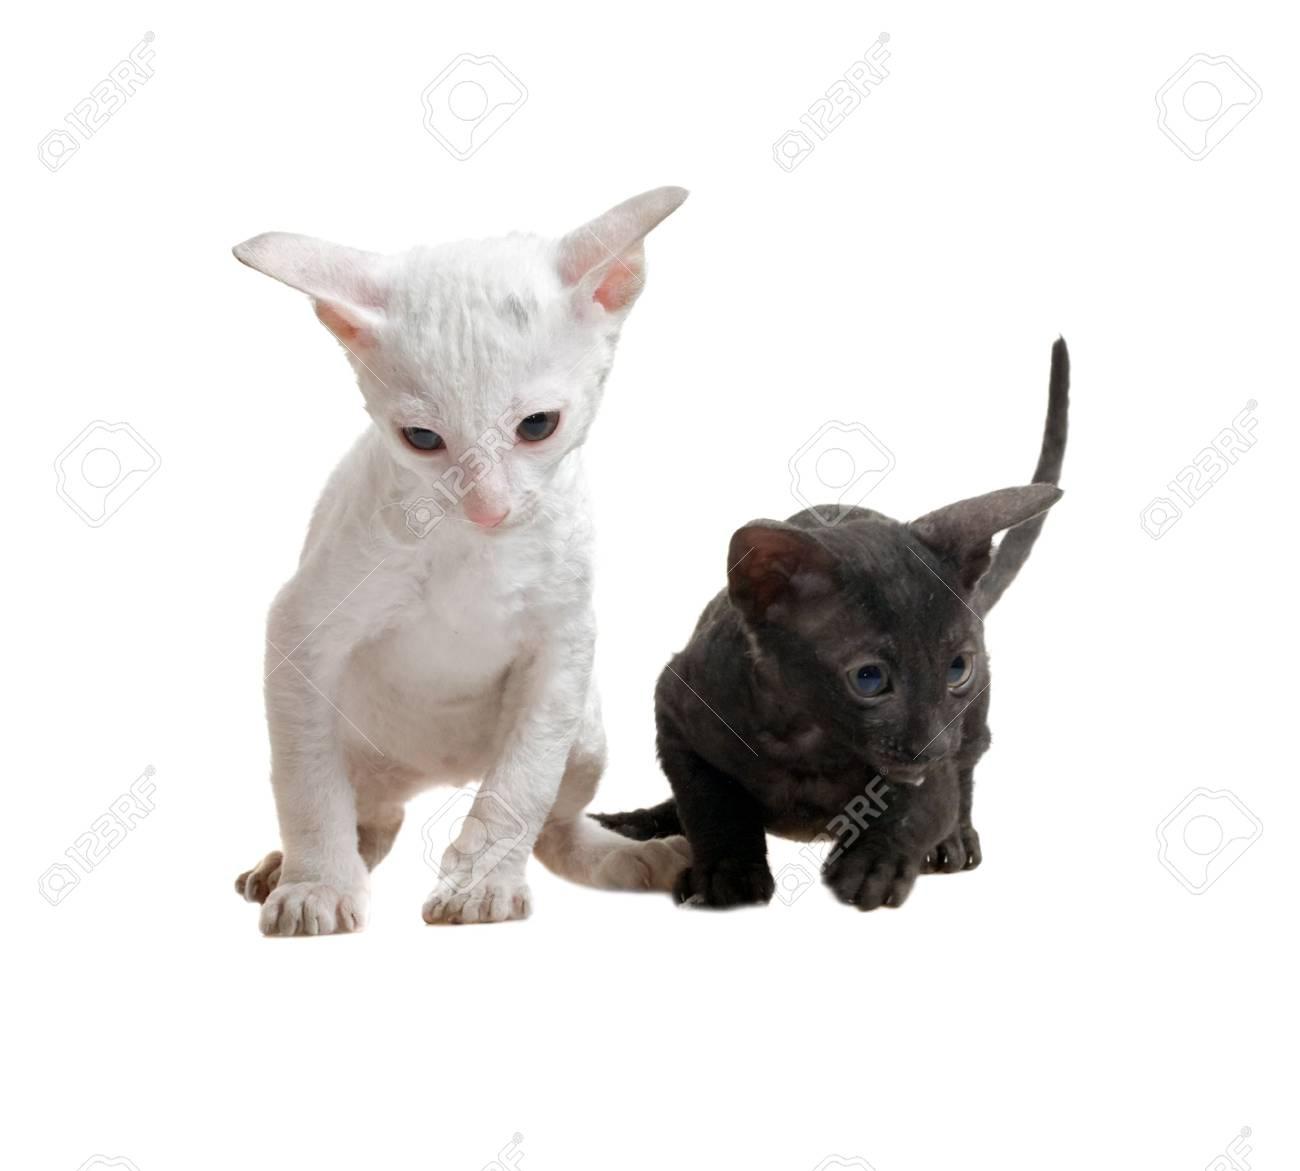 white and black cornish rex kittens isolated on white Stock Photo - 5498851